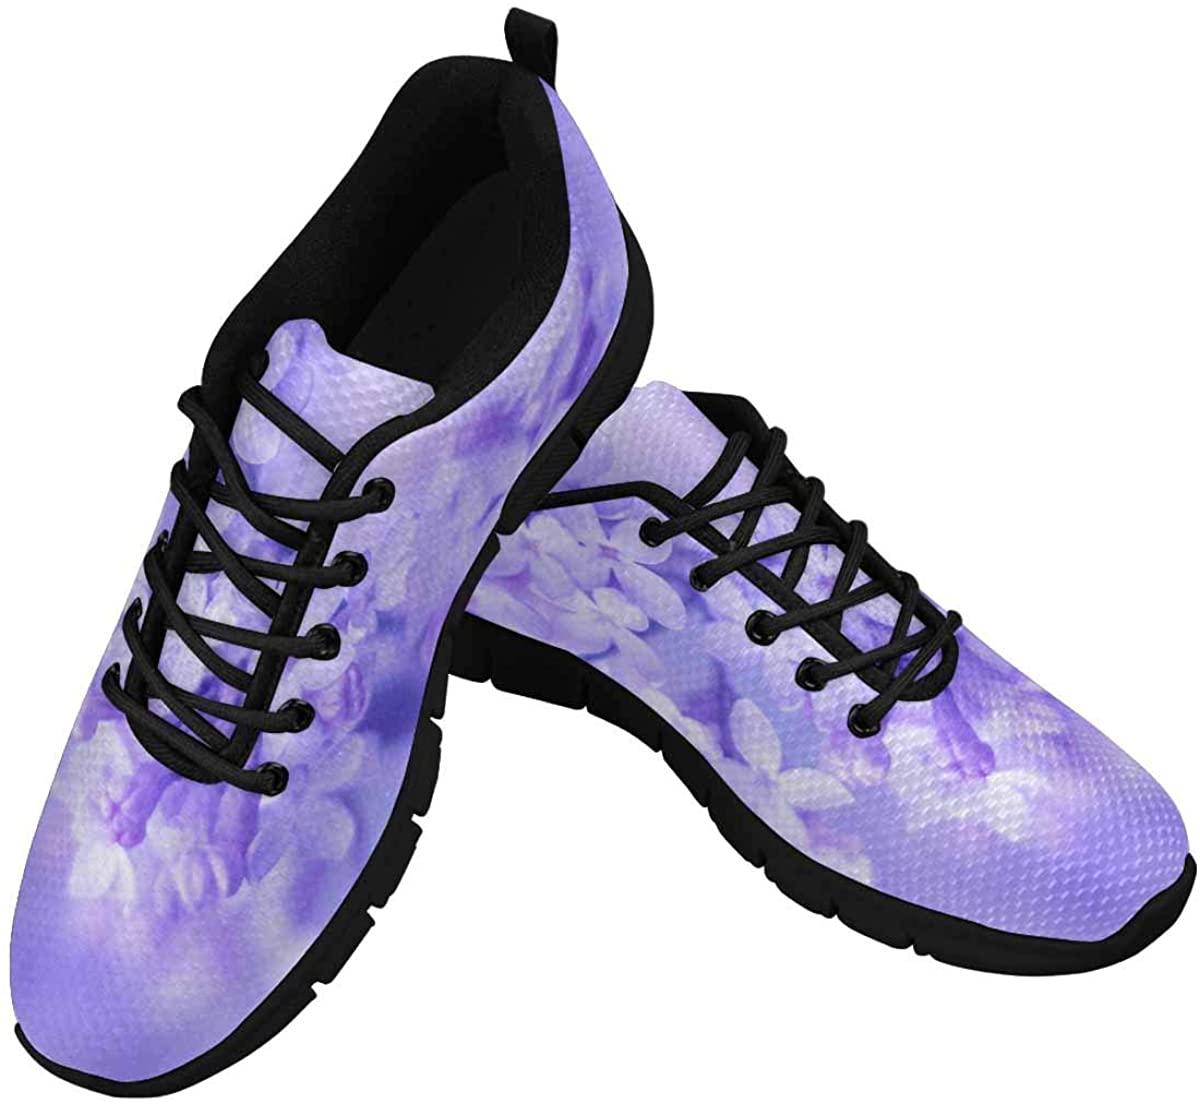 INTERESTPRINT Purple Flower Floral Women Walking Shoes Comfortable Lightweight Work Casual Travel Sneakers